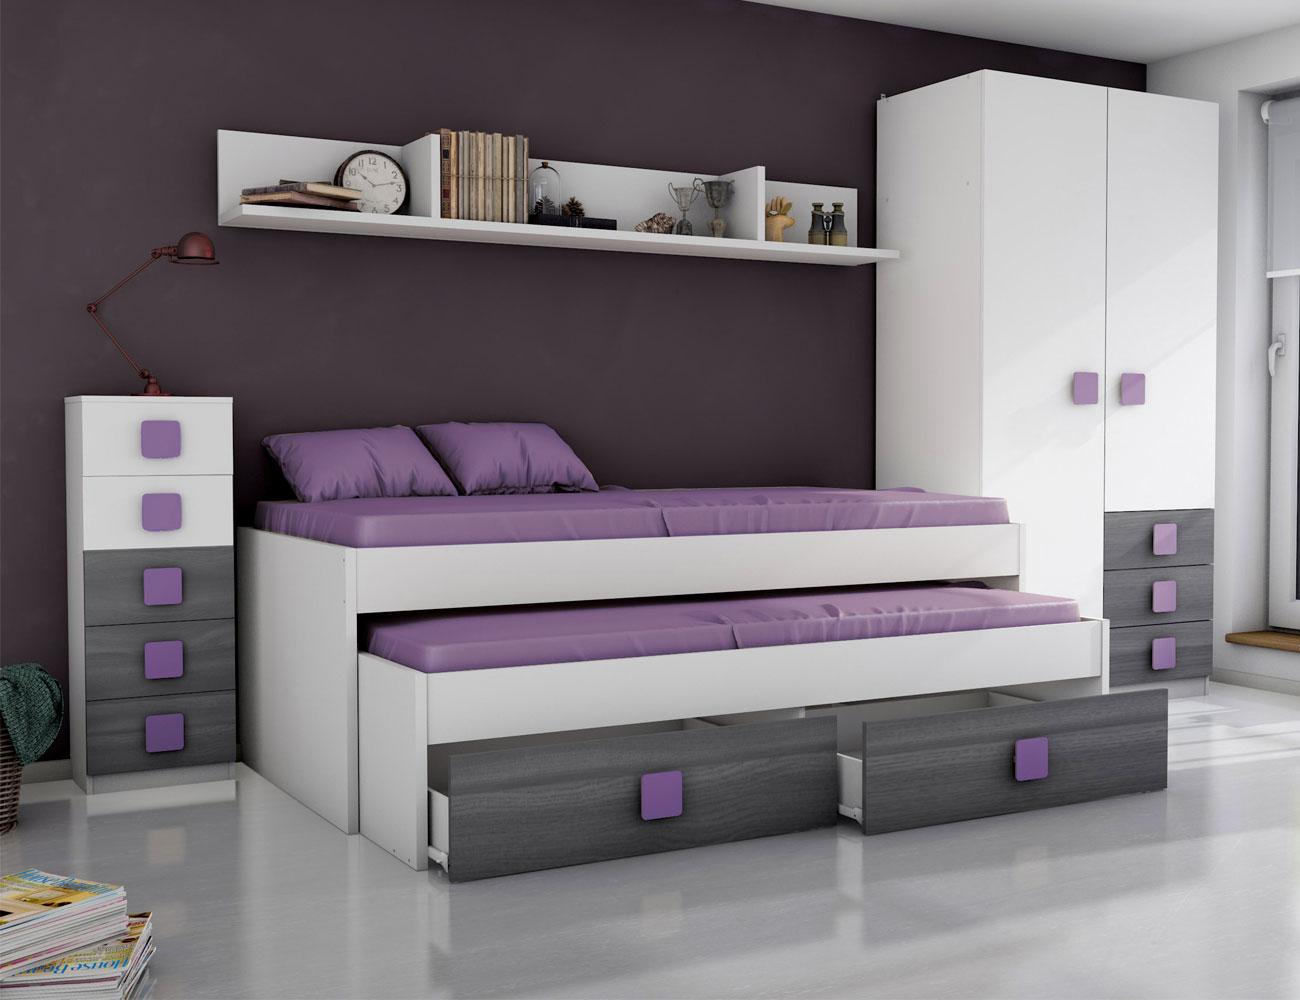 Dormitorio juvenil ceniza azul4